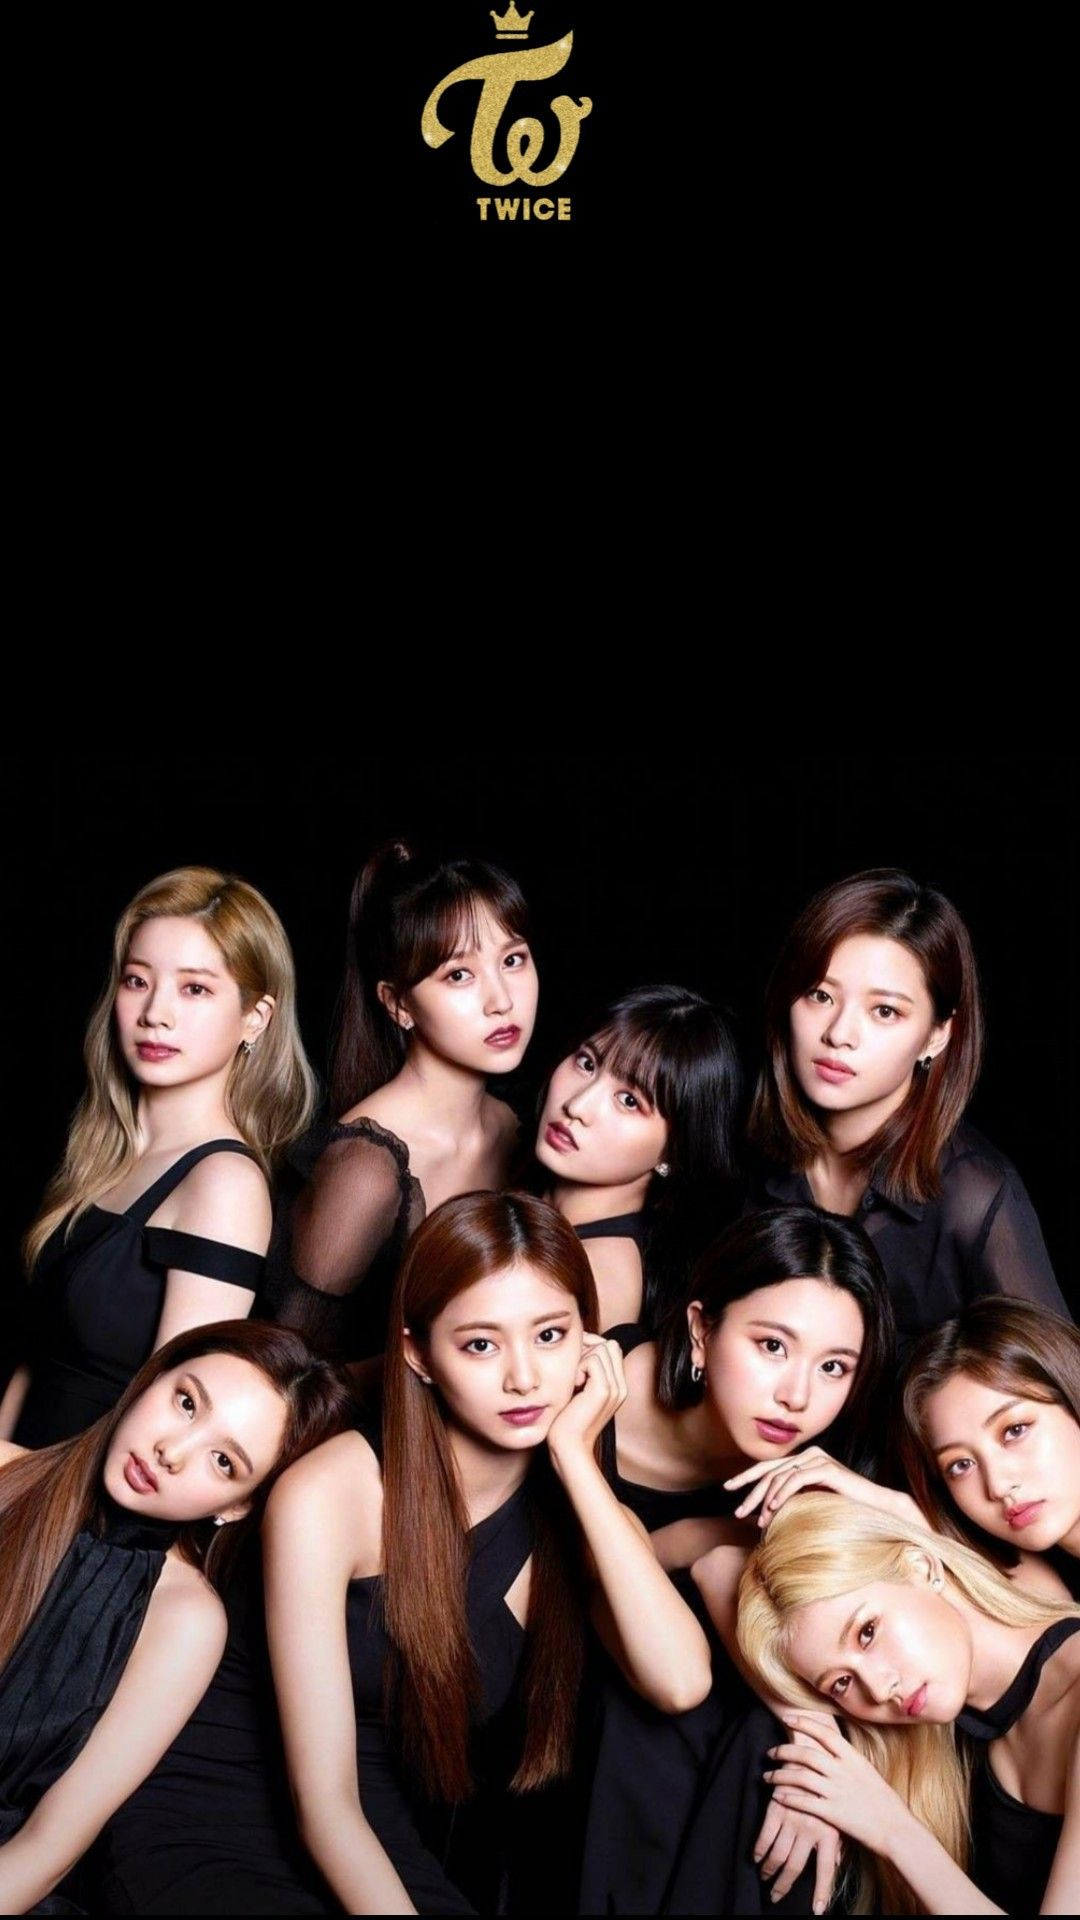 Twice Wallpaper Kpop Girl Groups Kpop Wallpaper Twice Group